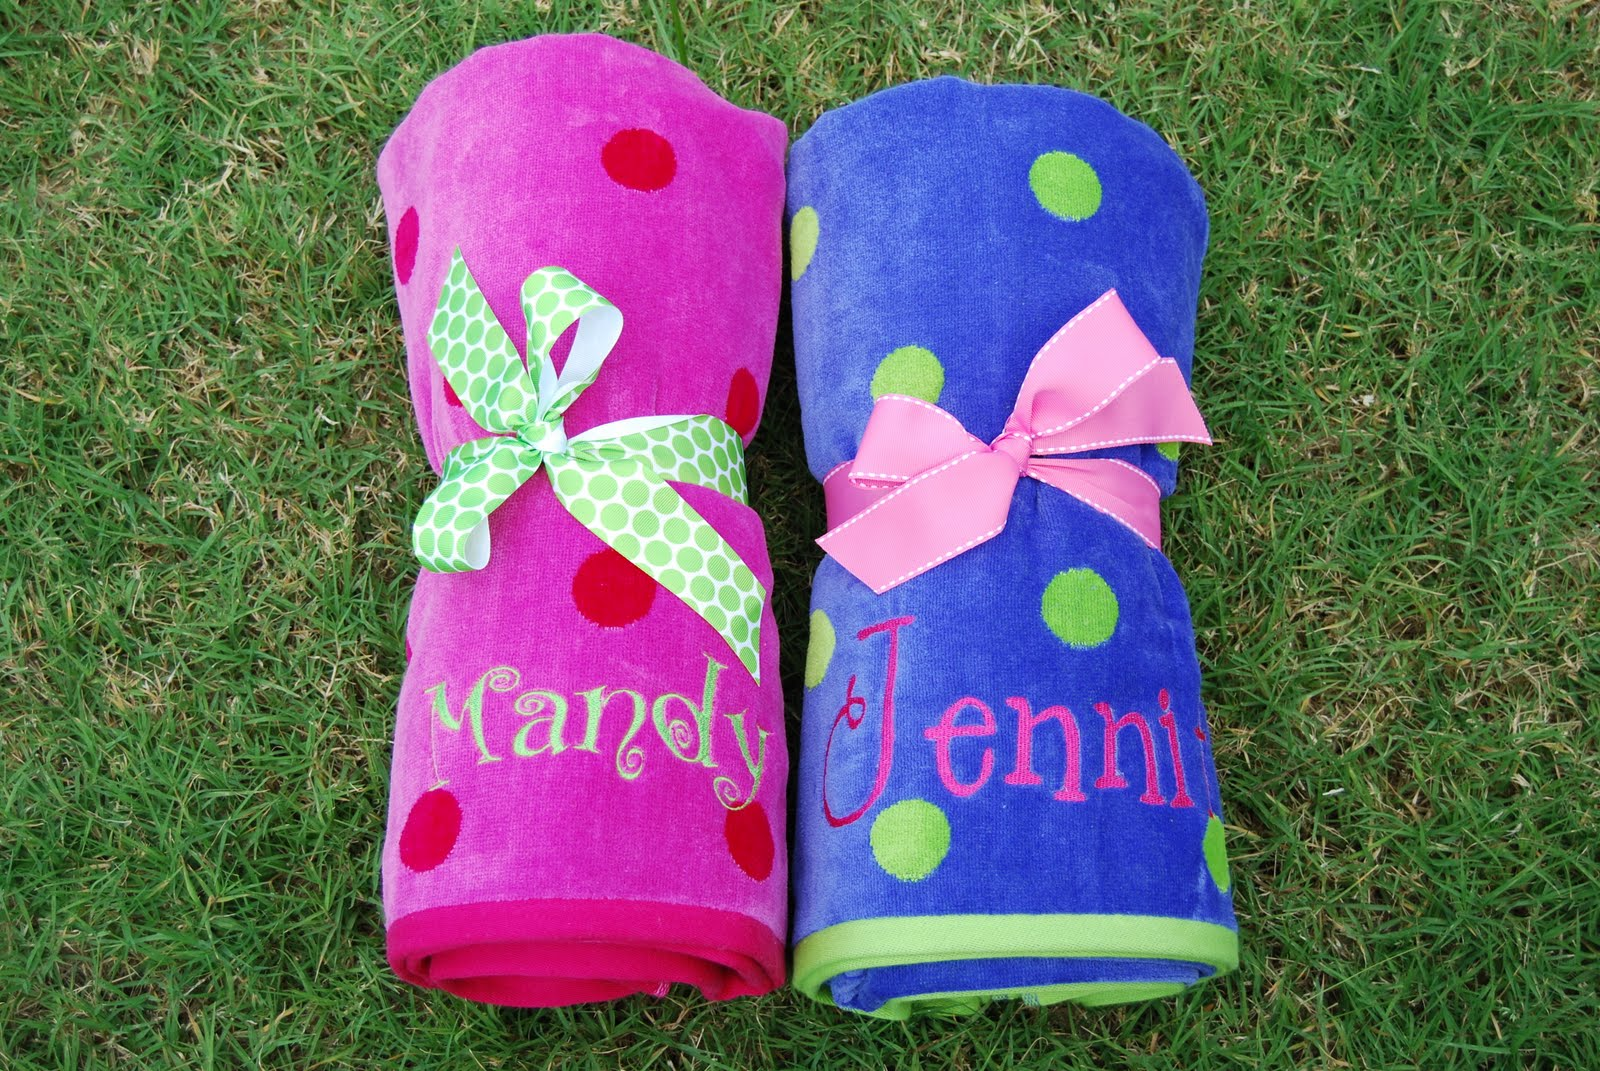 monogrammed beach towels - Monogrammed Beach Towels